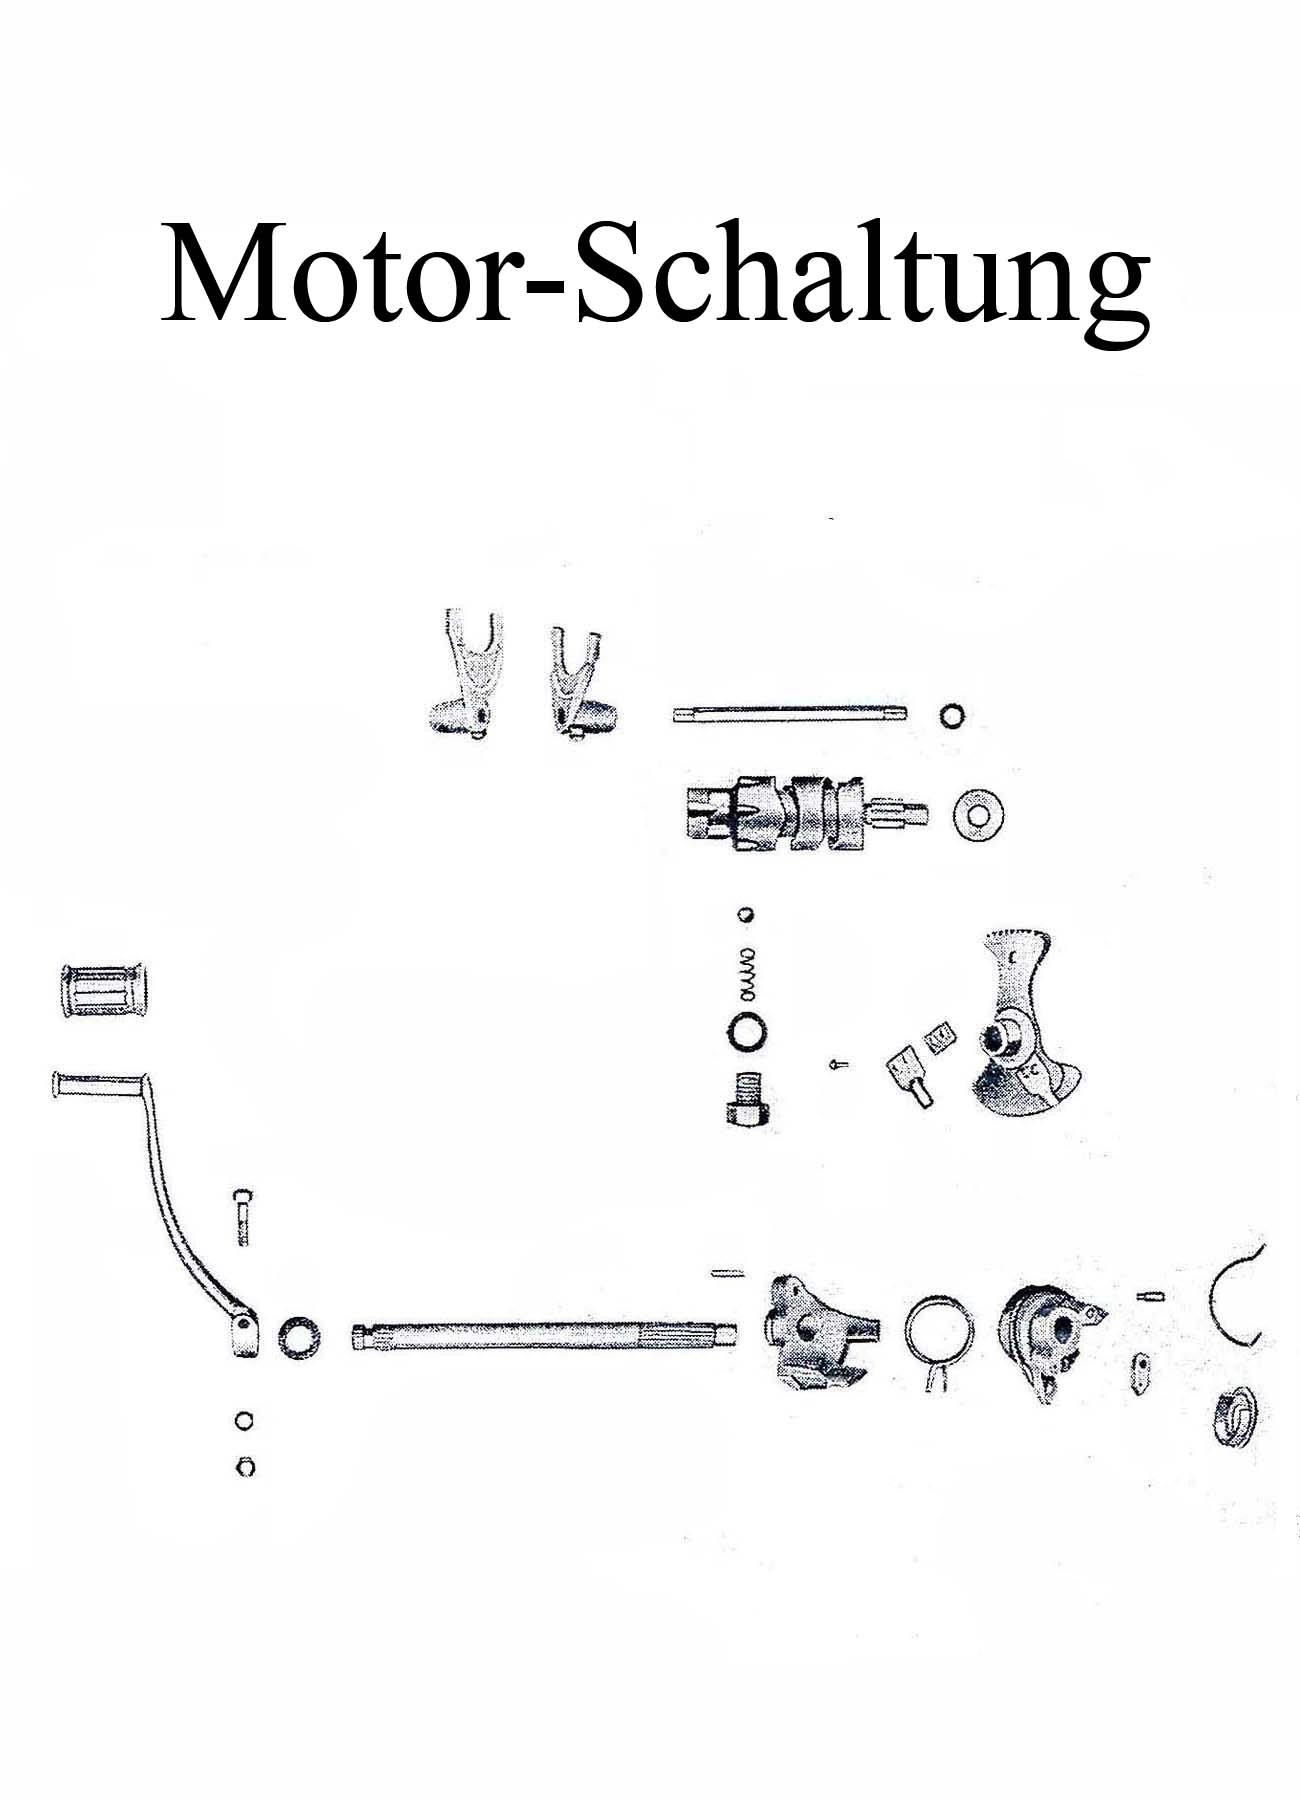 MZ ES 175-250/0-1 Ersatzteileliste Motor Schaltung Fußschalthebelgummi Welle Schaltklinkenarretierfeder